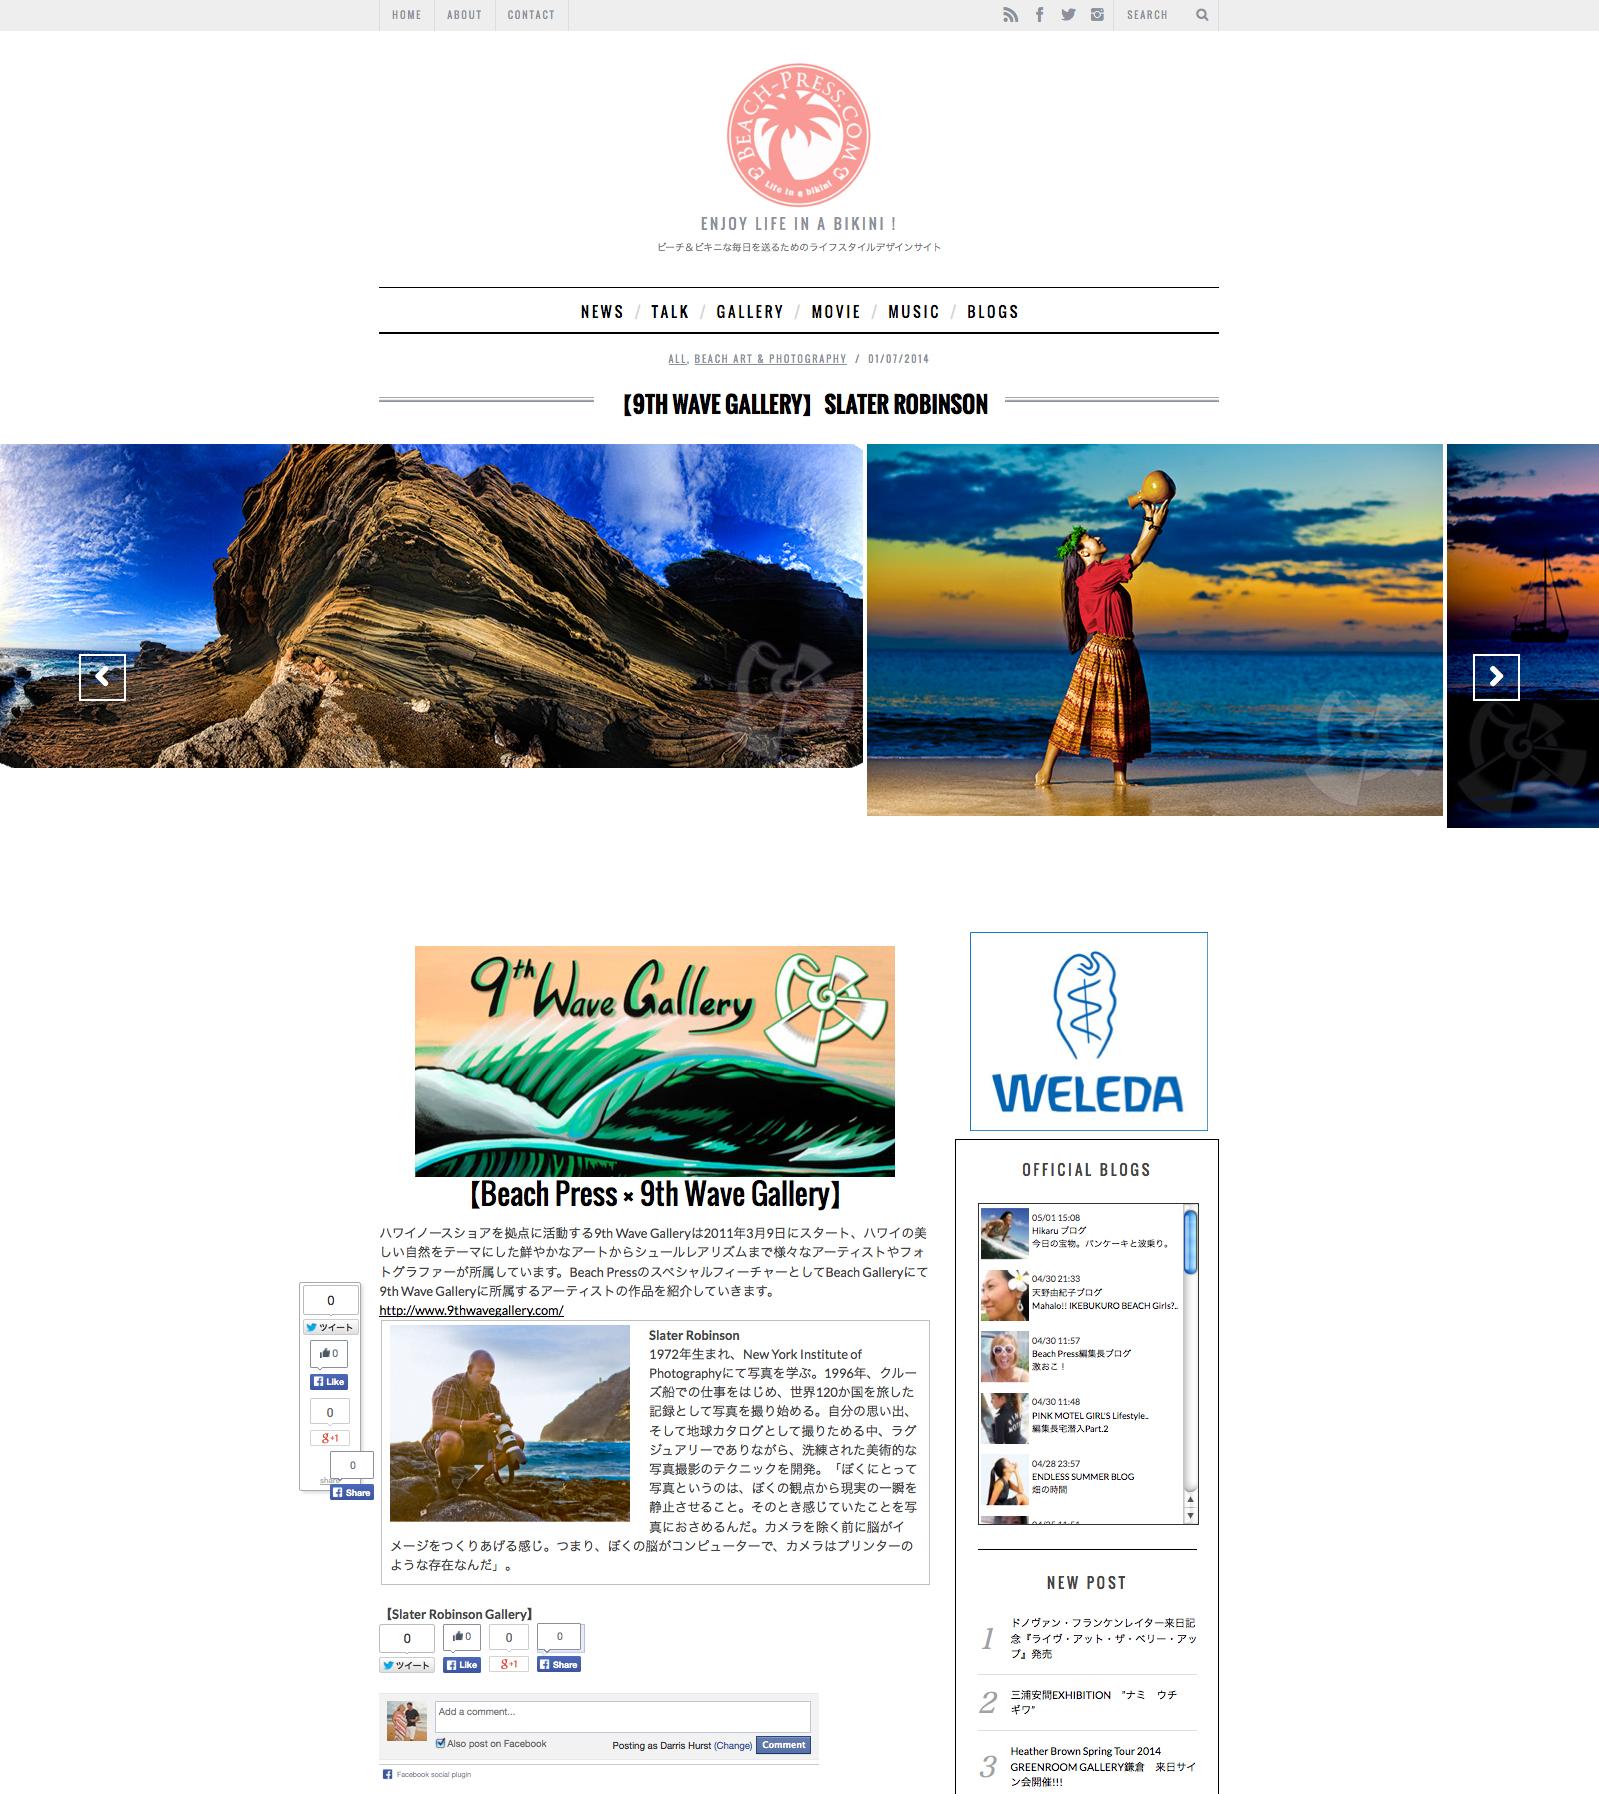 2014-01-07-slater-robinson-beach-press.jpg